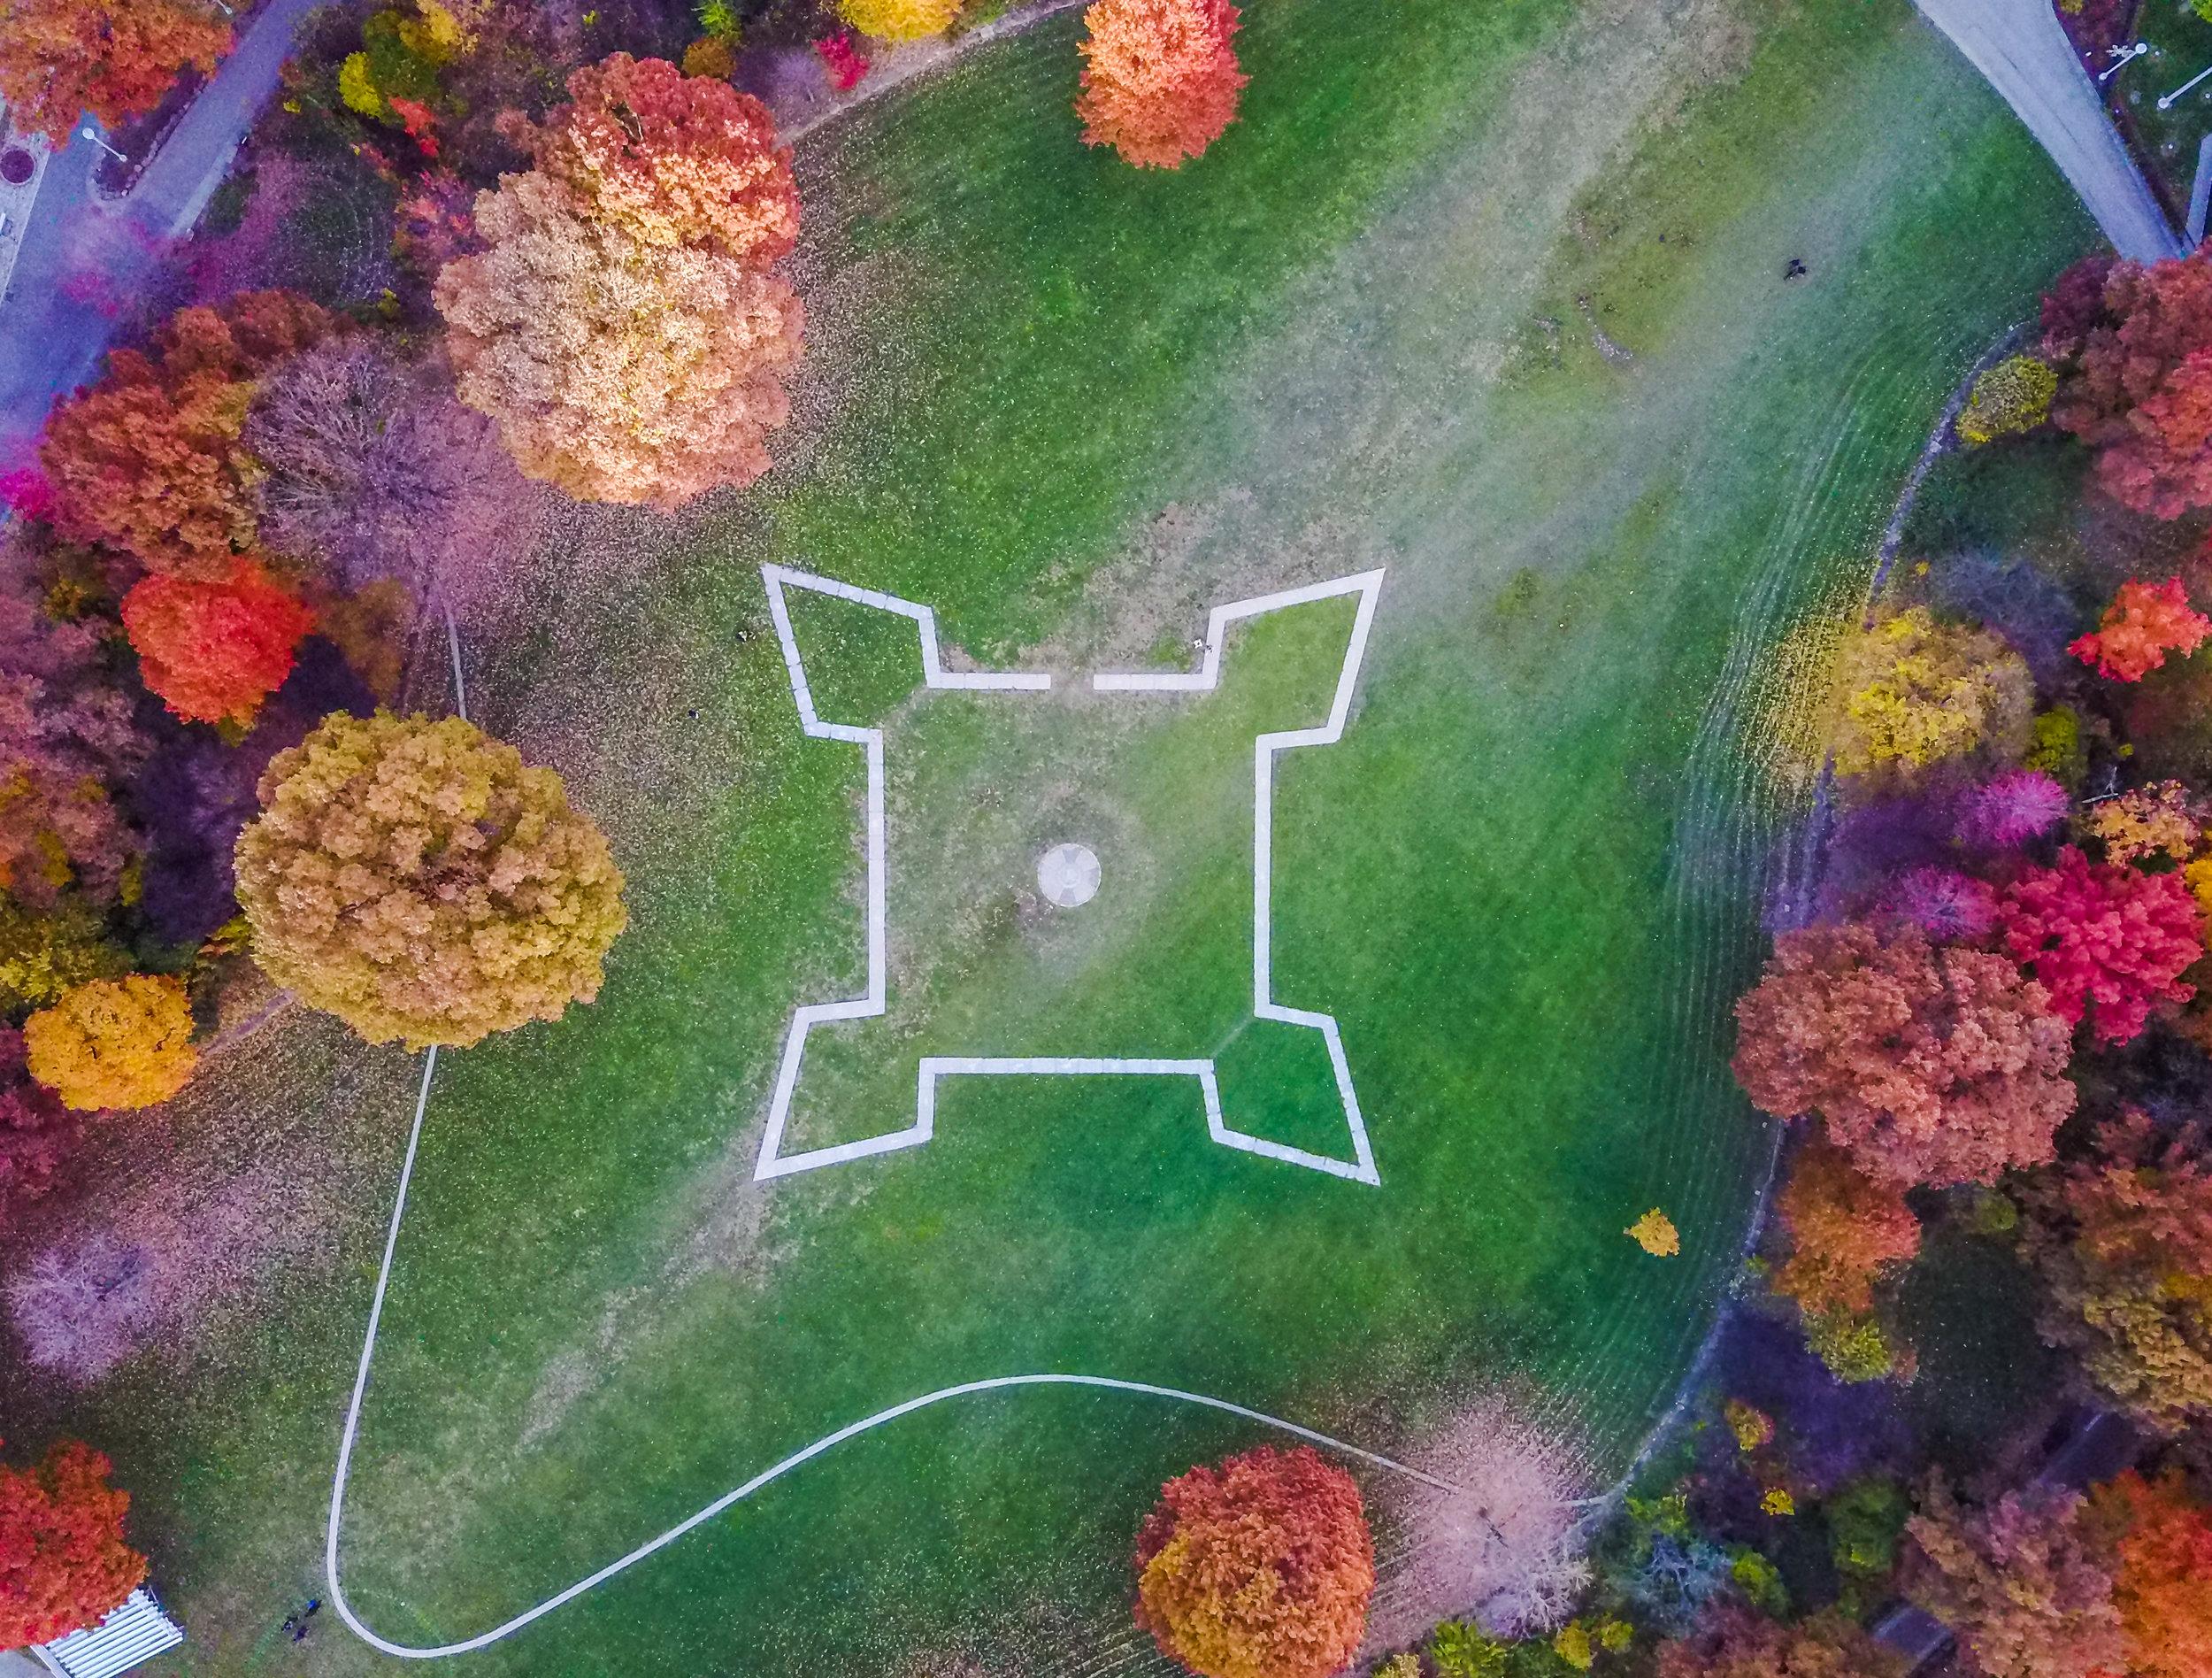 Fall '18 Drone Finals-8.jpg